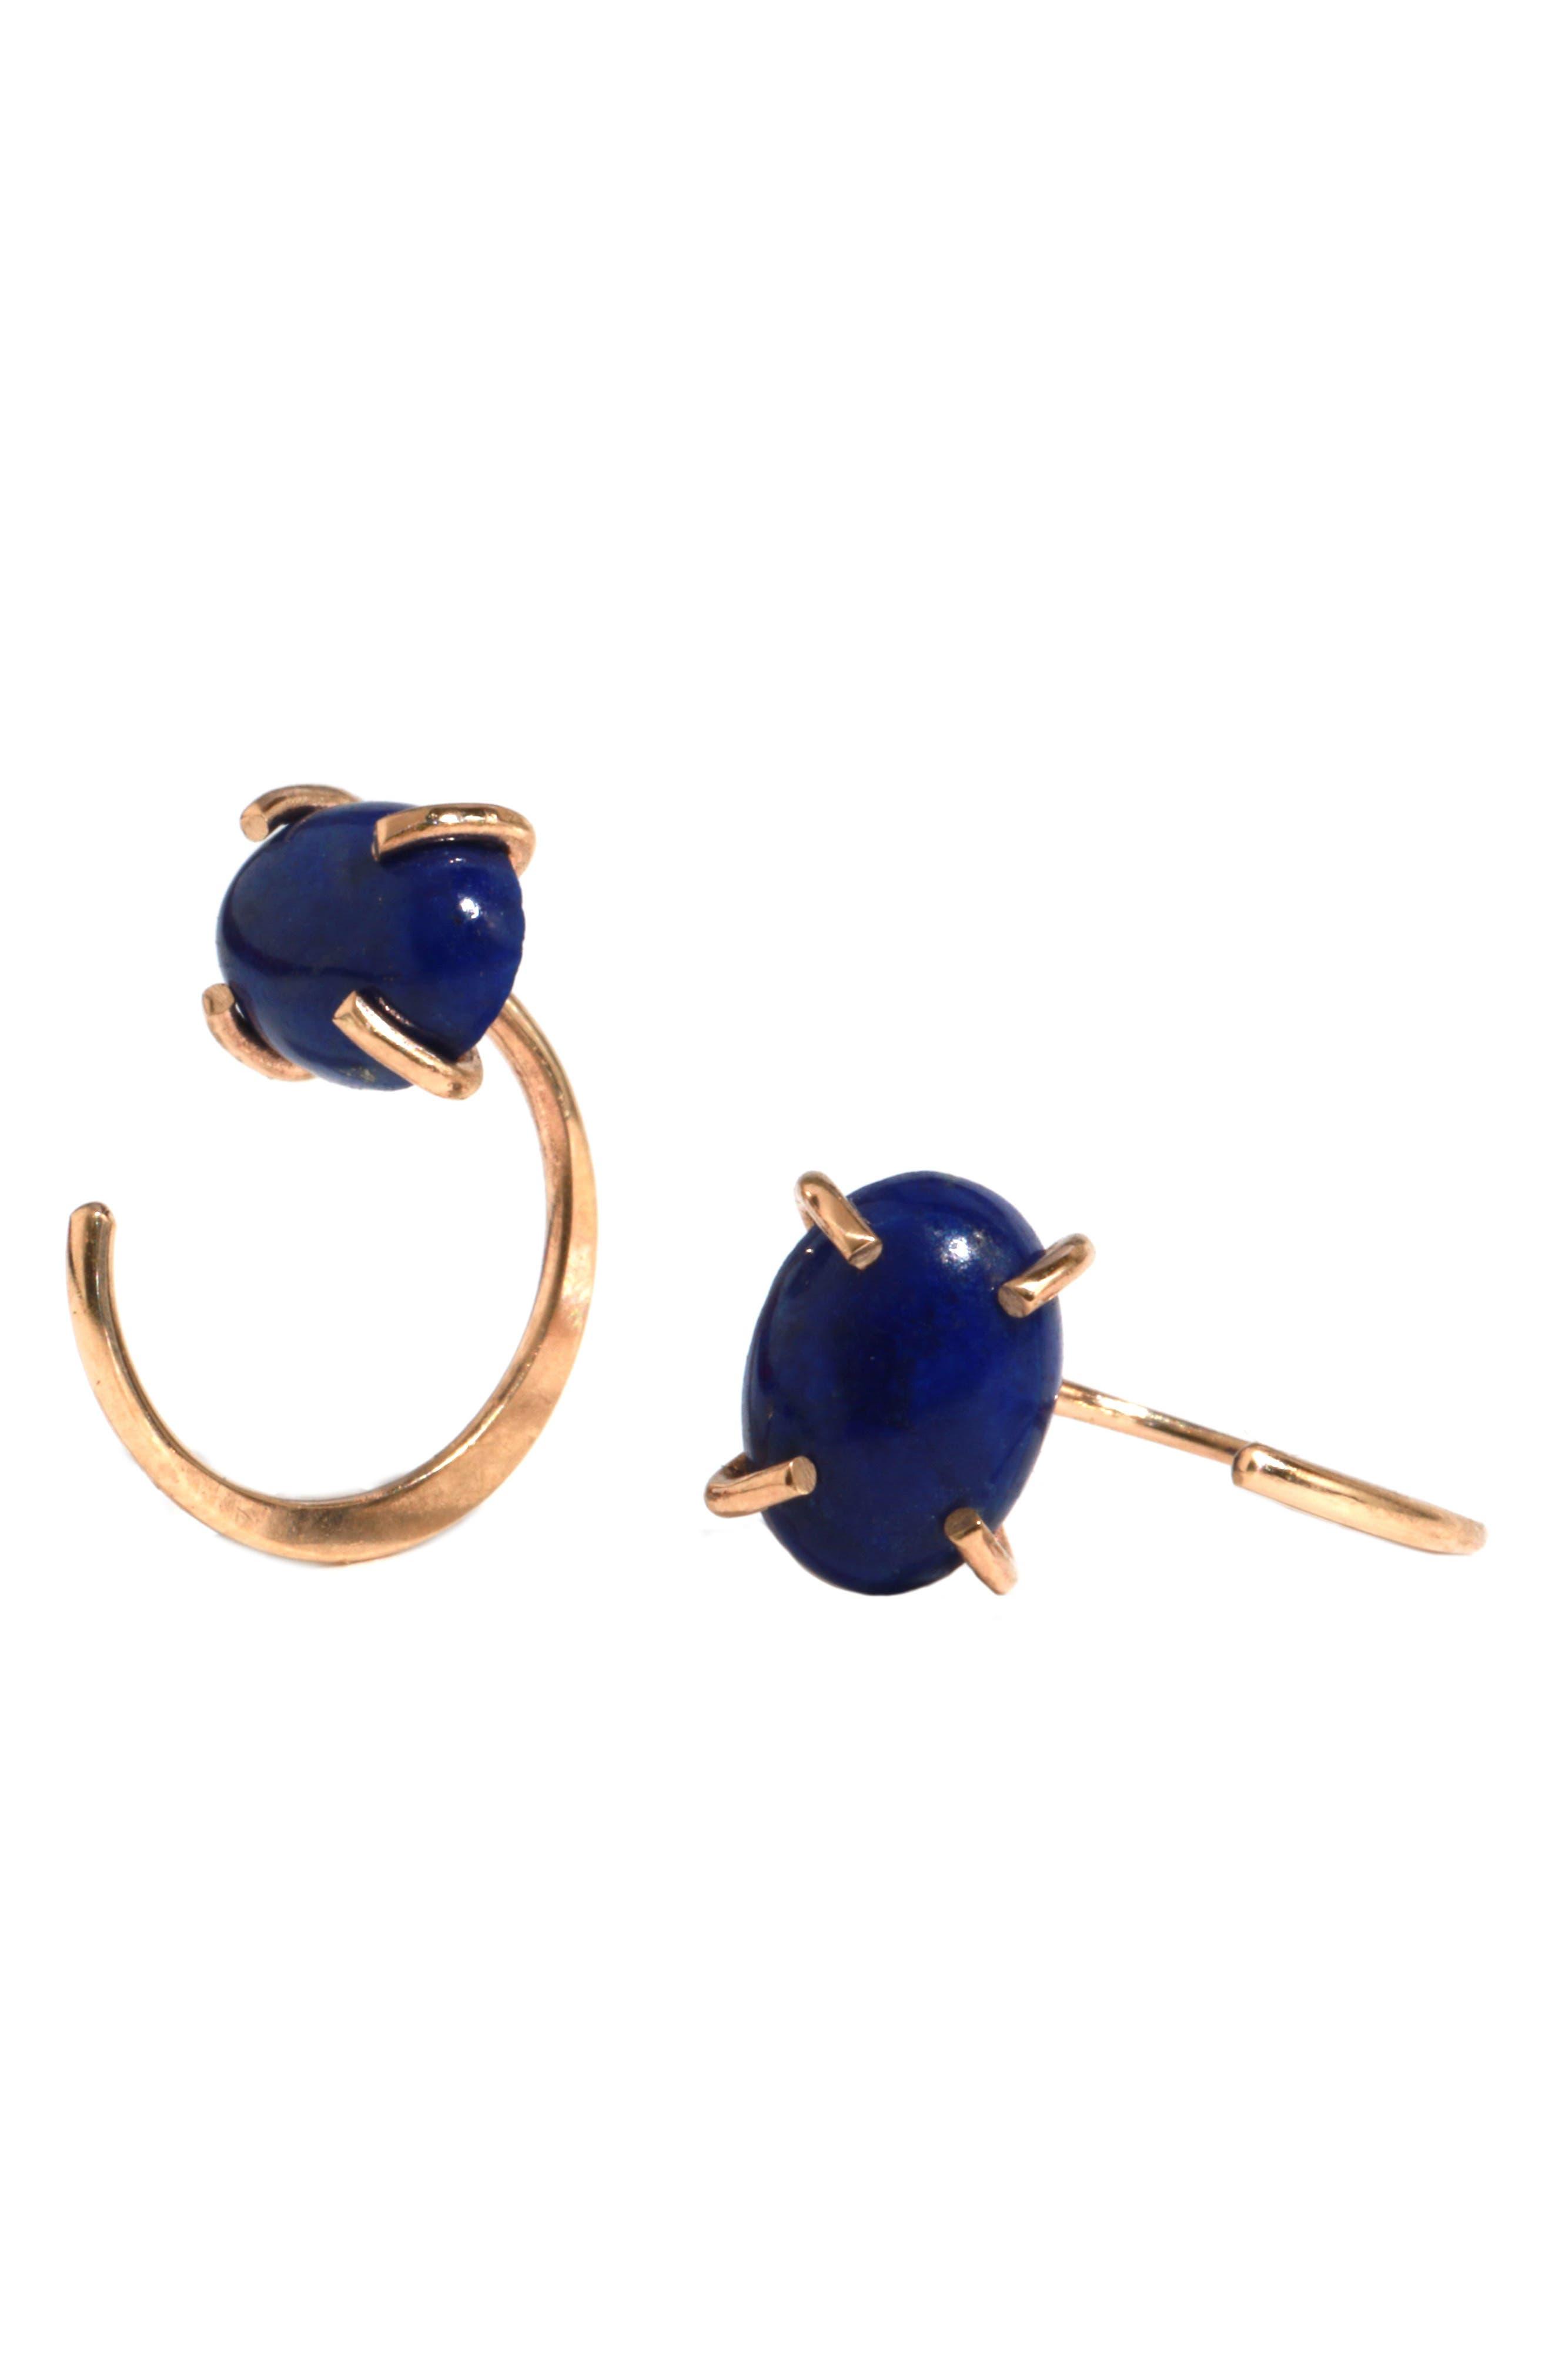 Lapis Lazuli Earrings,                         Main,                         color, Yellow Gold